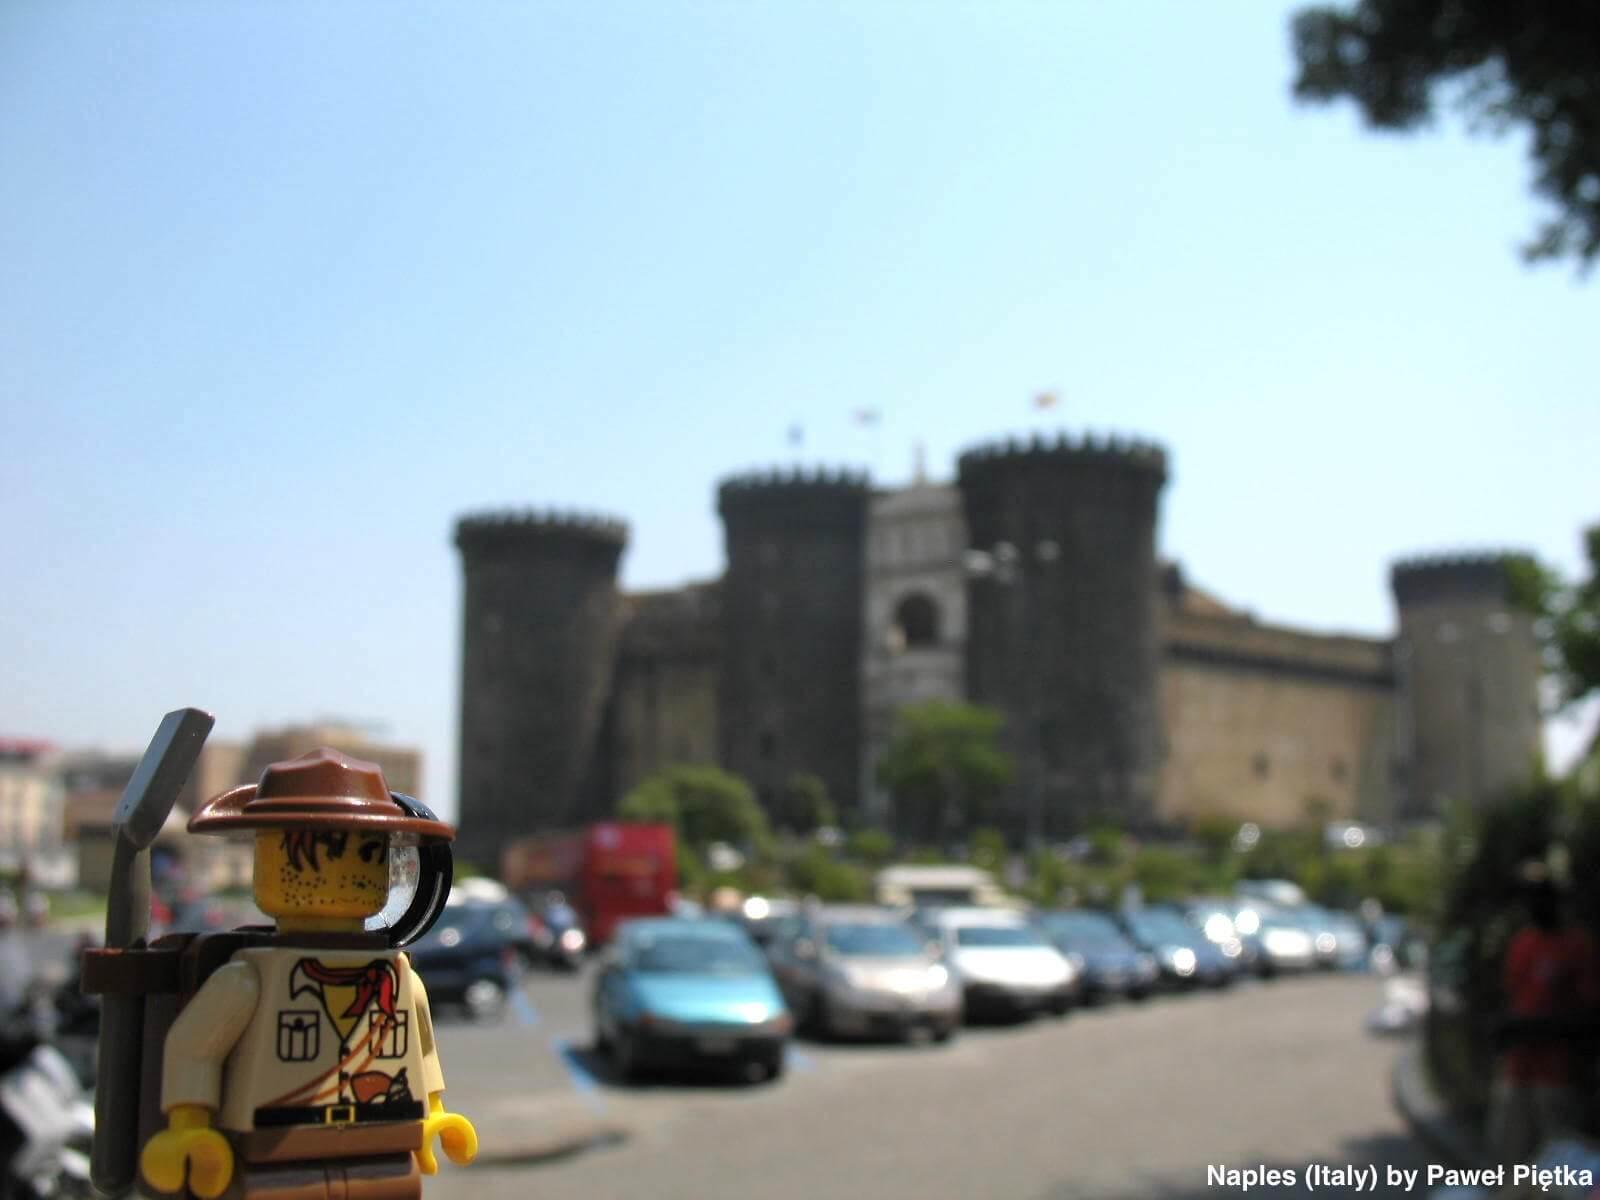 Naples (Italy) - Castel Nuovo